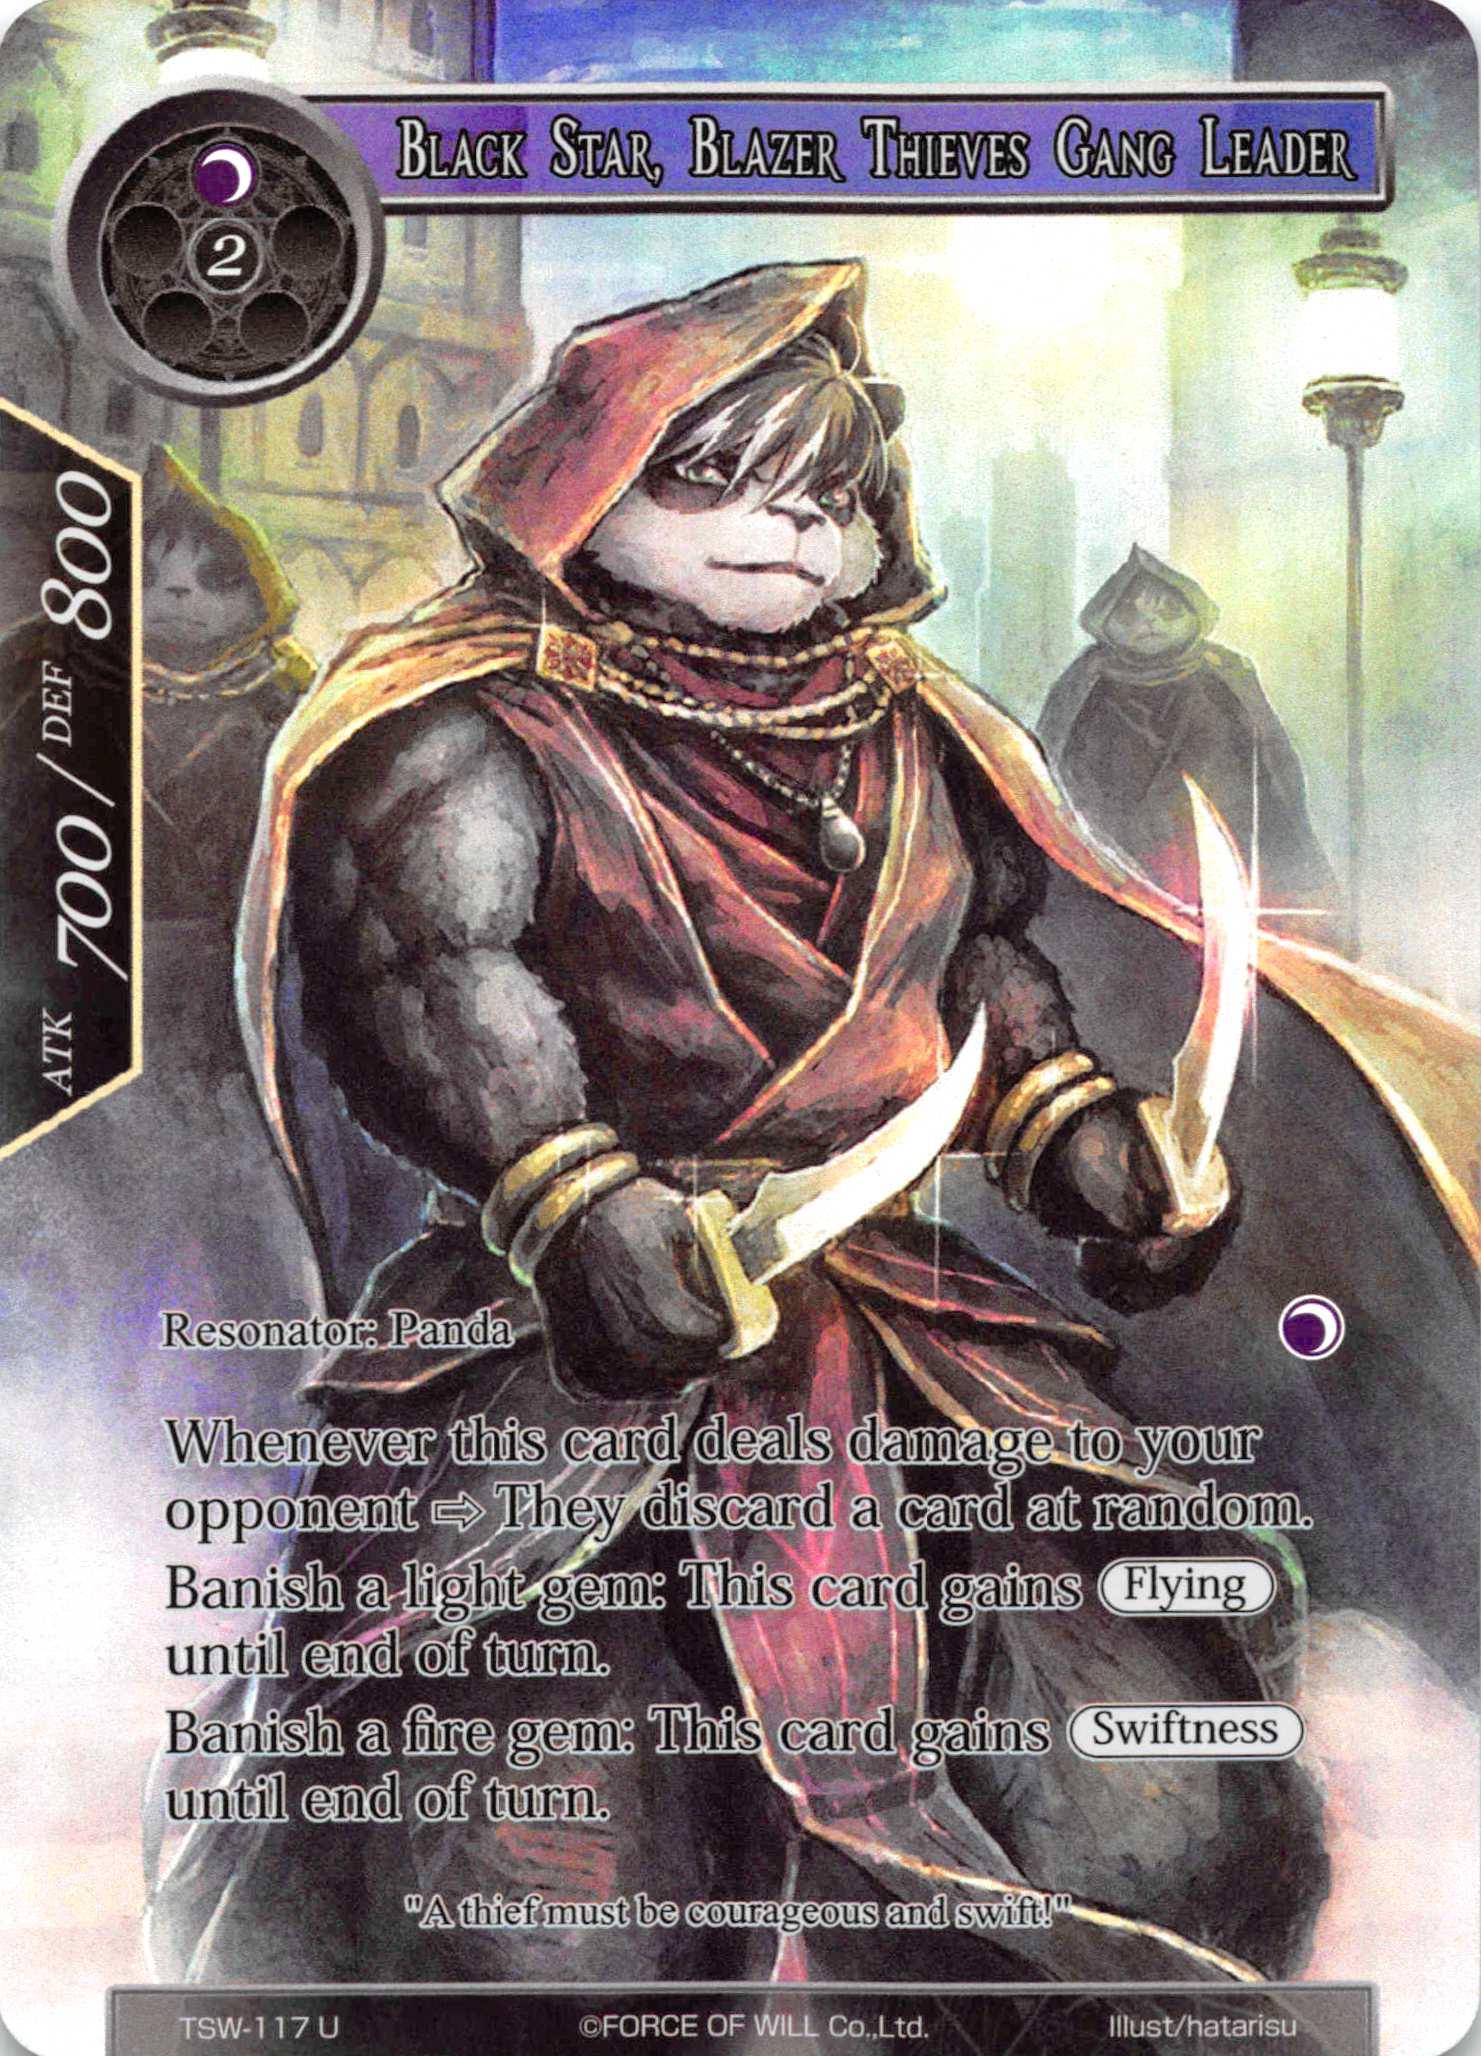 Black Star, Blazer Thieves Gang Leader (Full Art) - TSW-117 - U